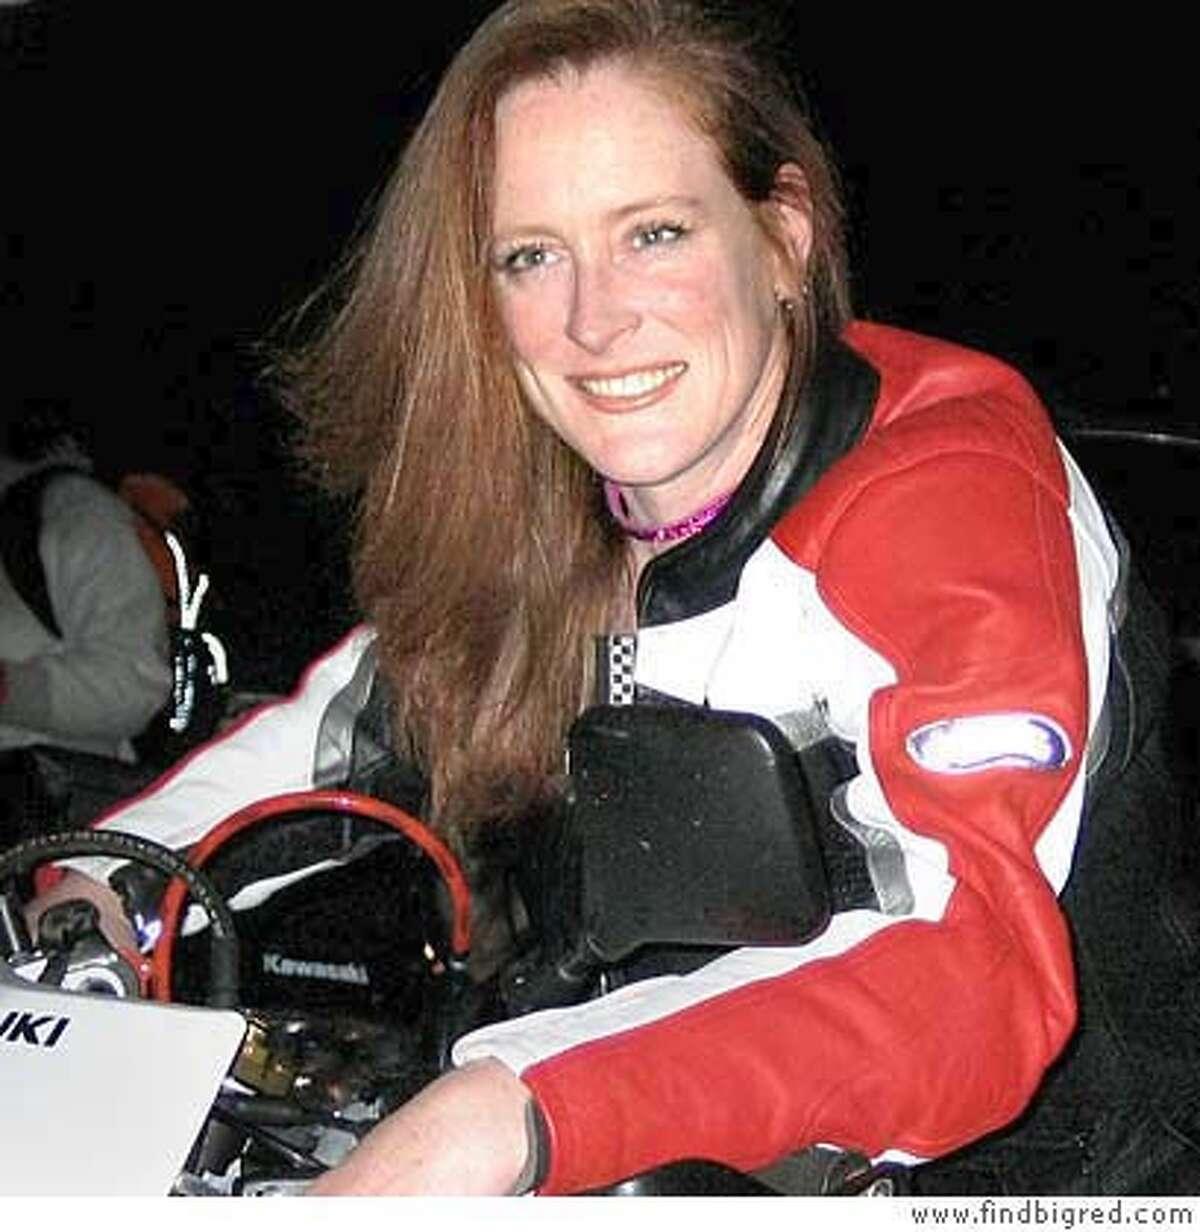 Melinda Moore, Santa Rosa motorcyclist missing since 9/19/05